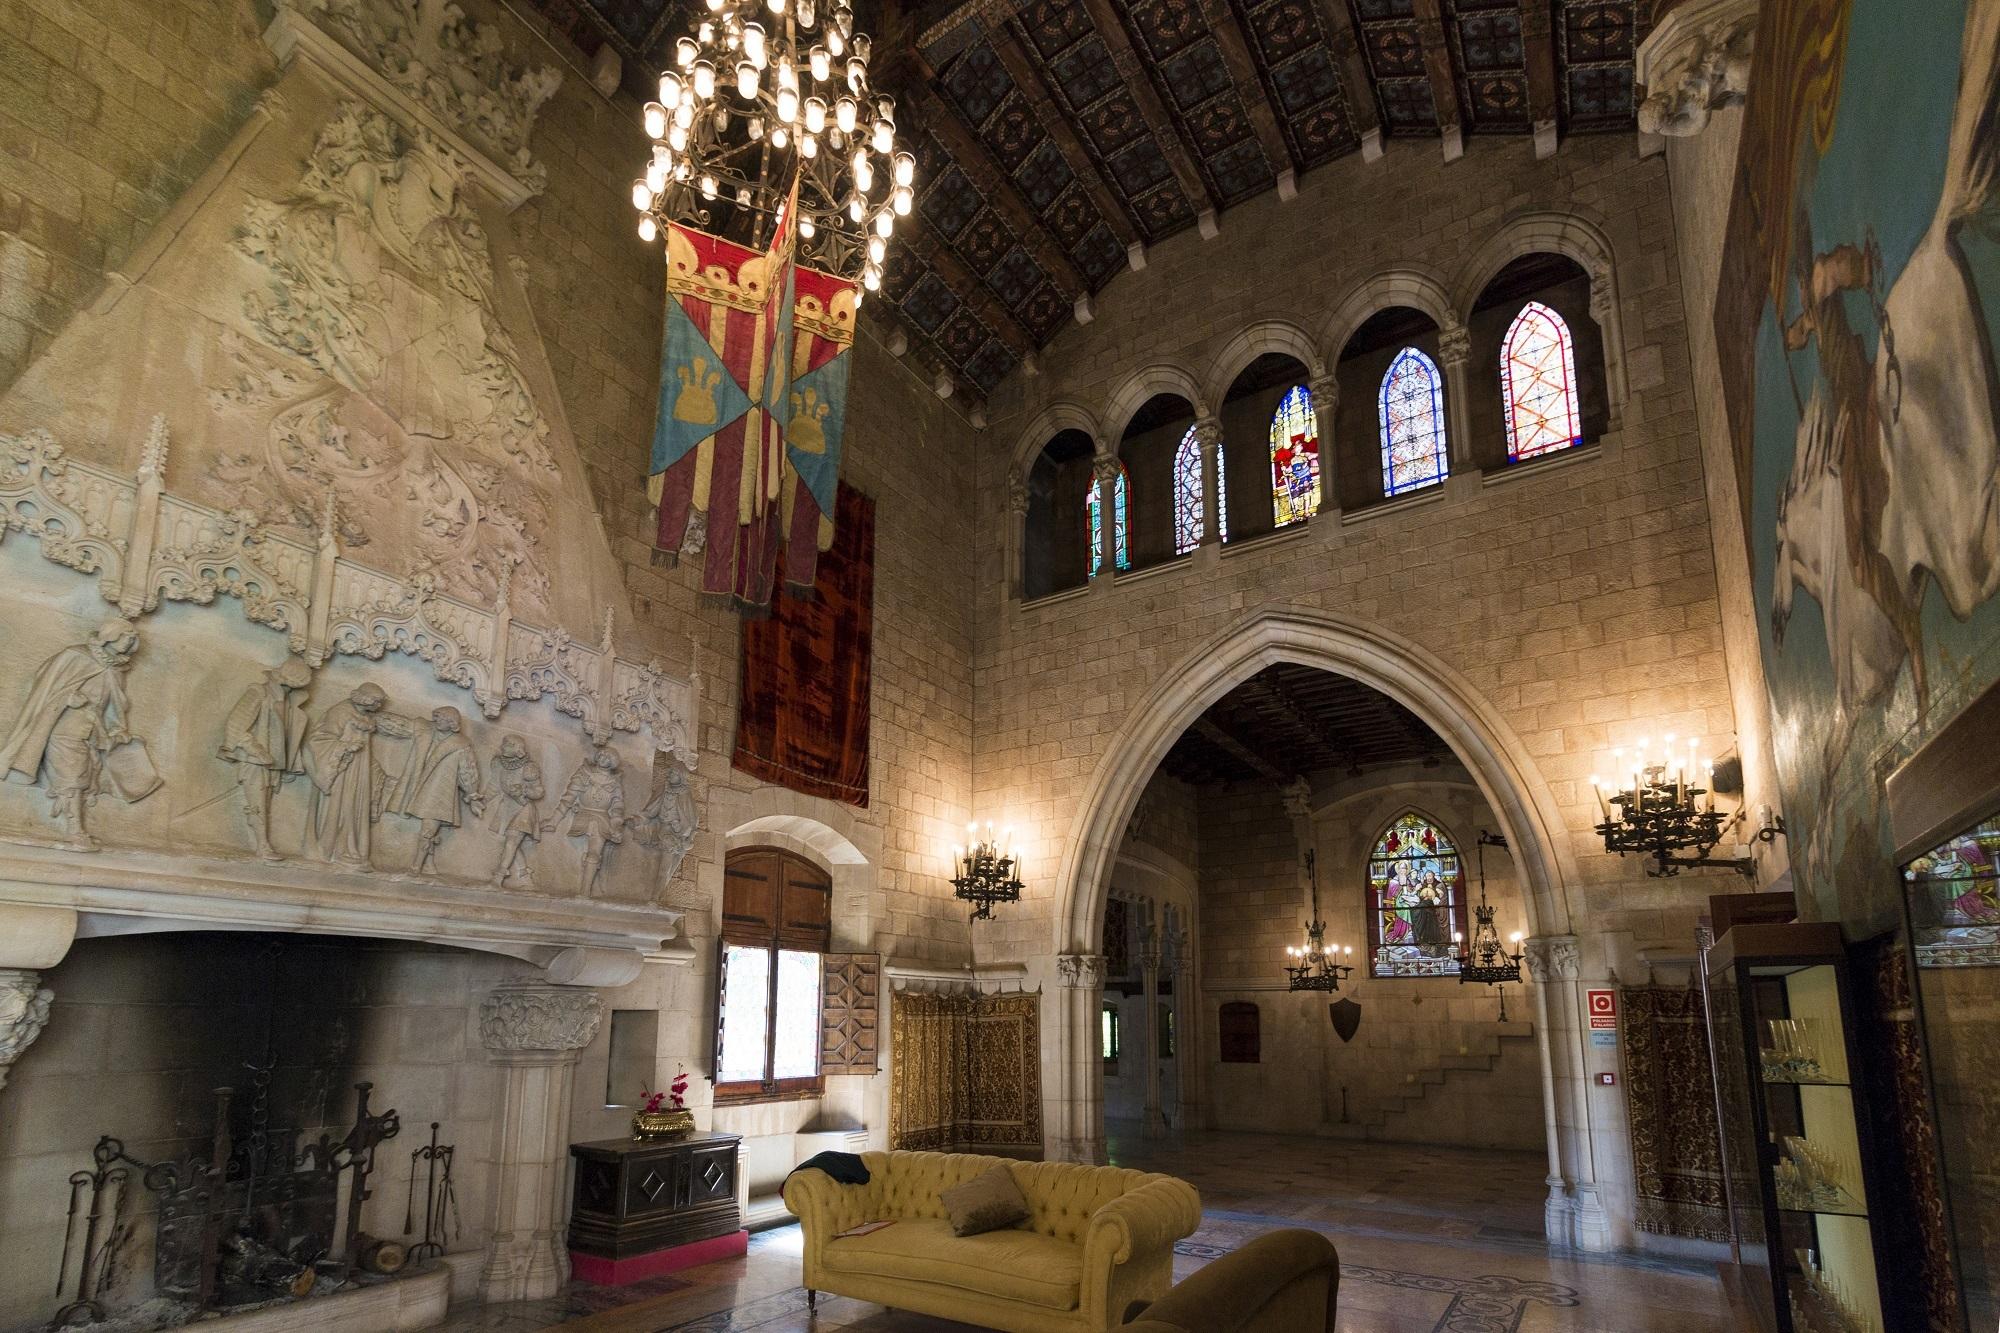 Castell de Santa Florentina interior Canet de Mar